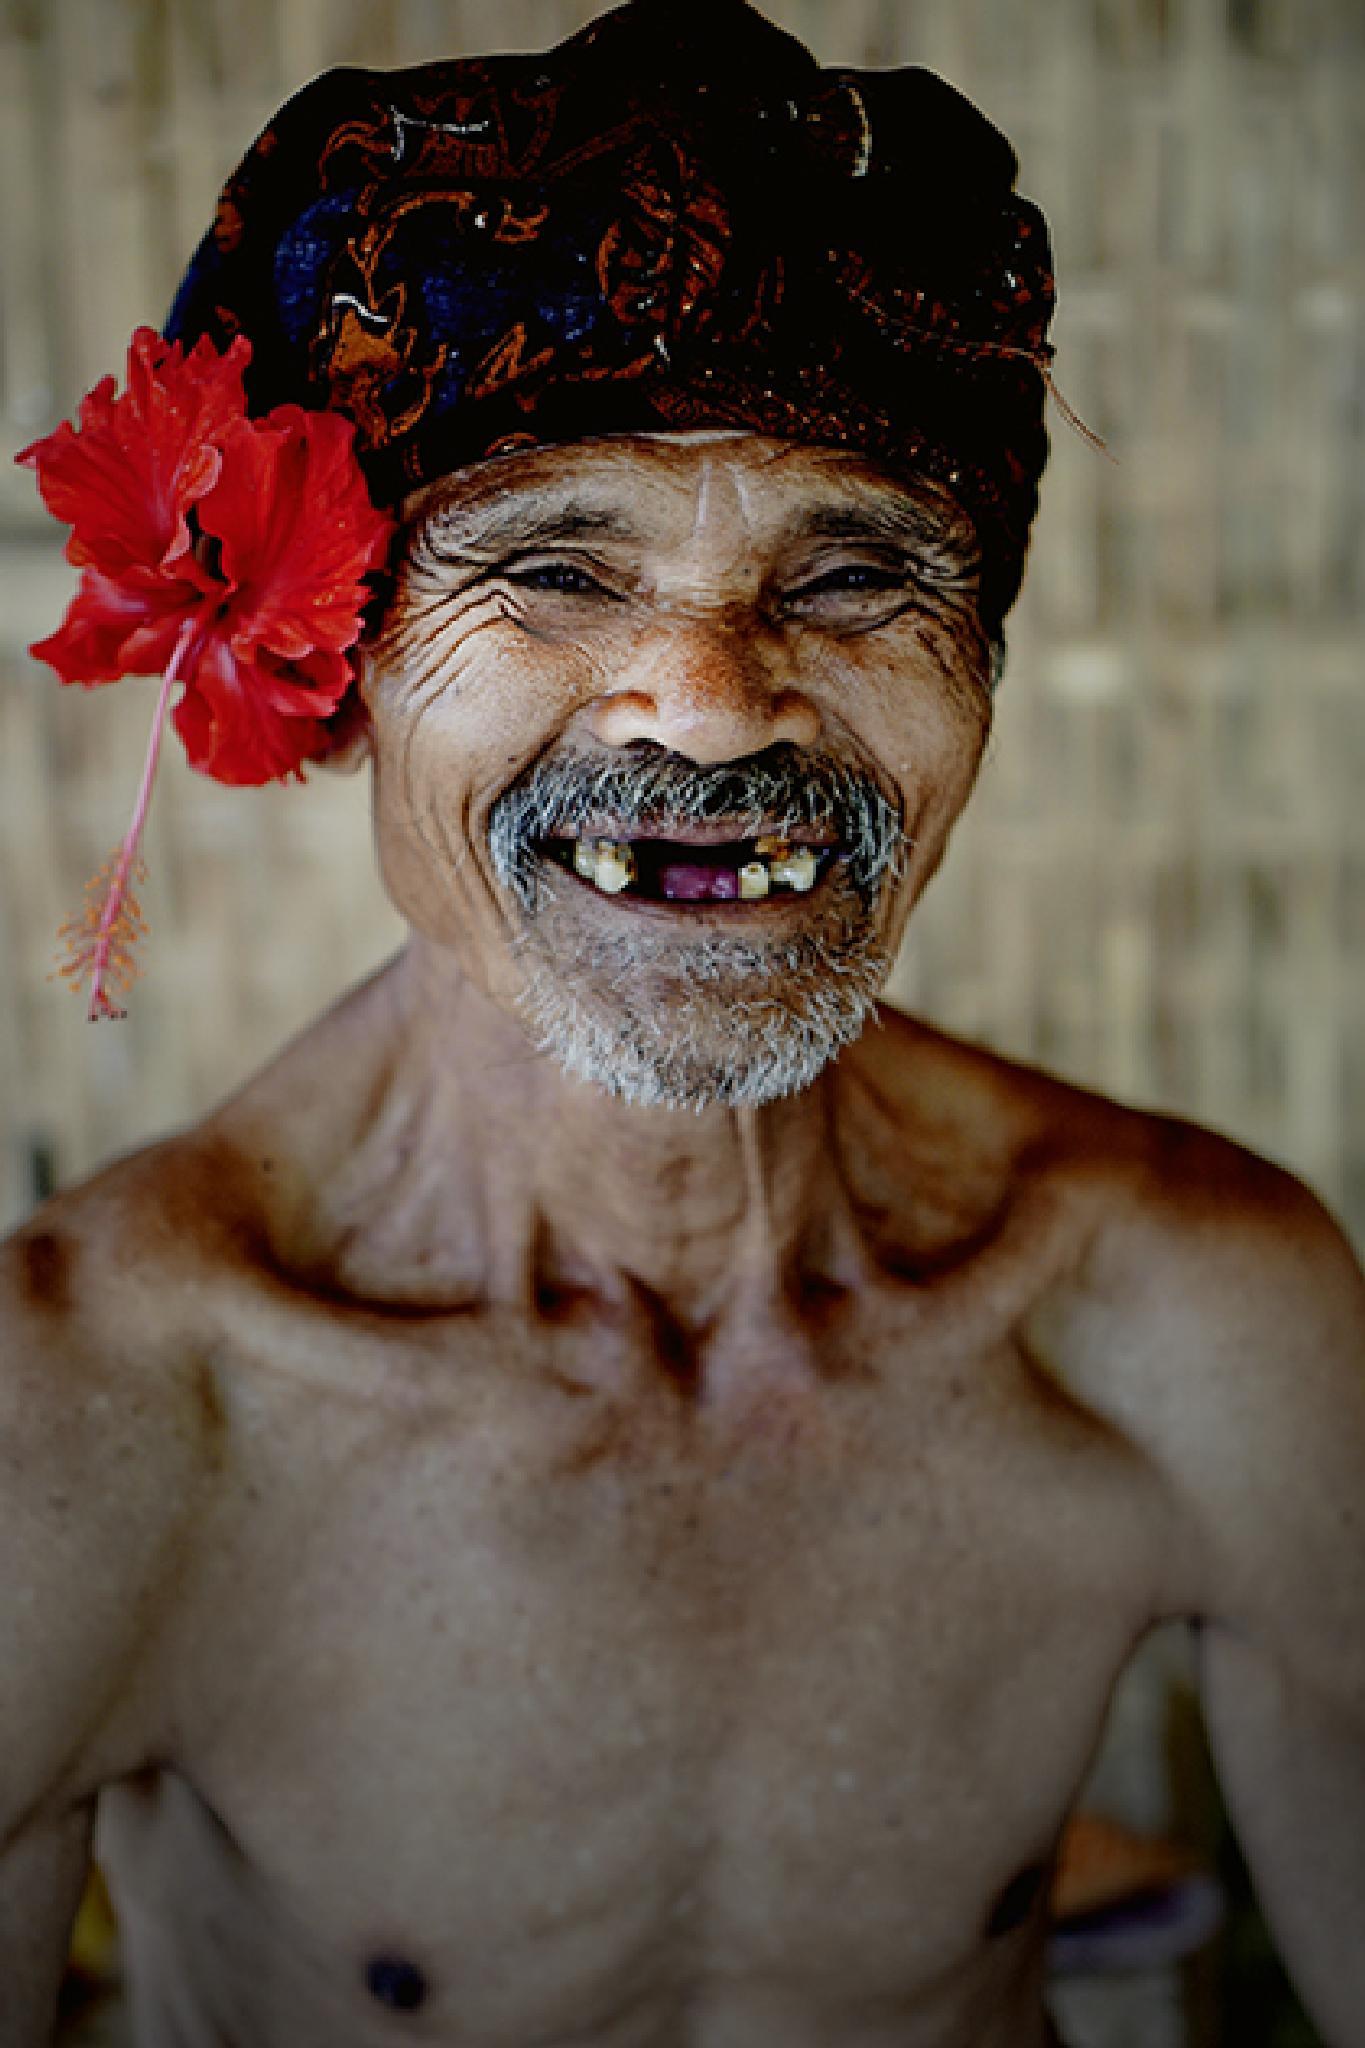 Portrait of Balinese man by yangunayasa63